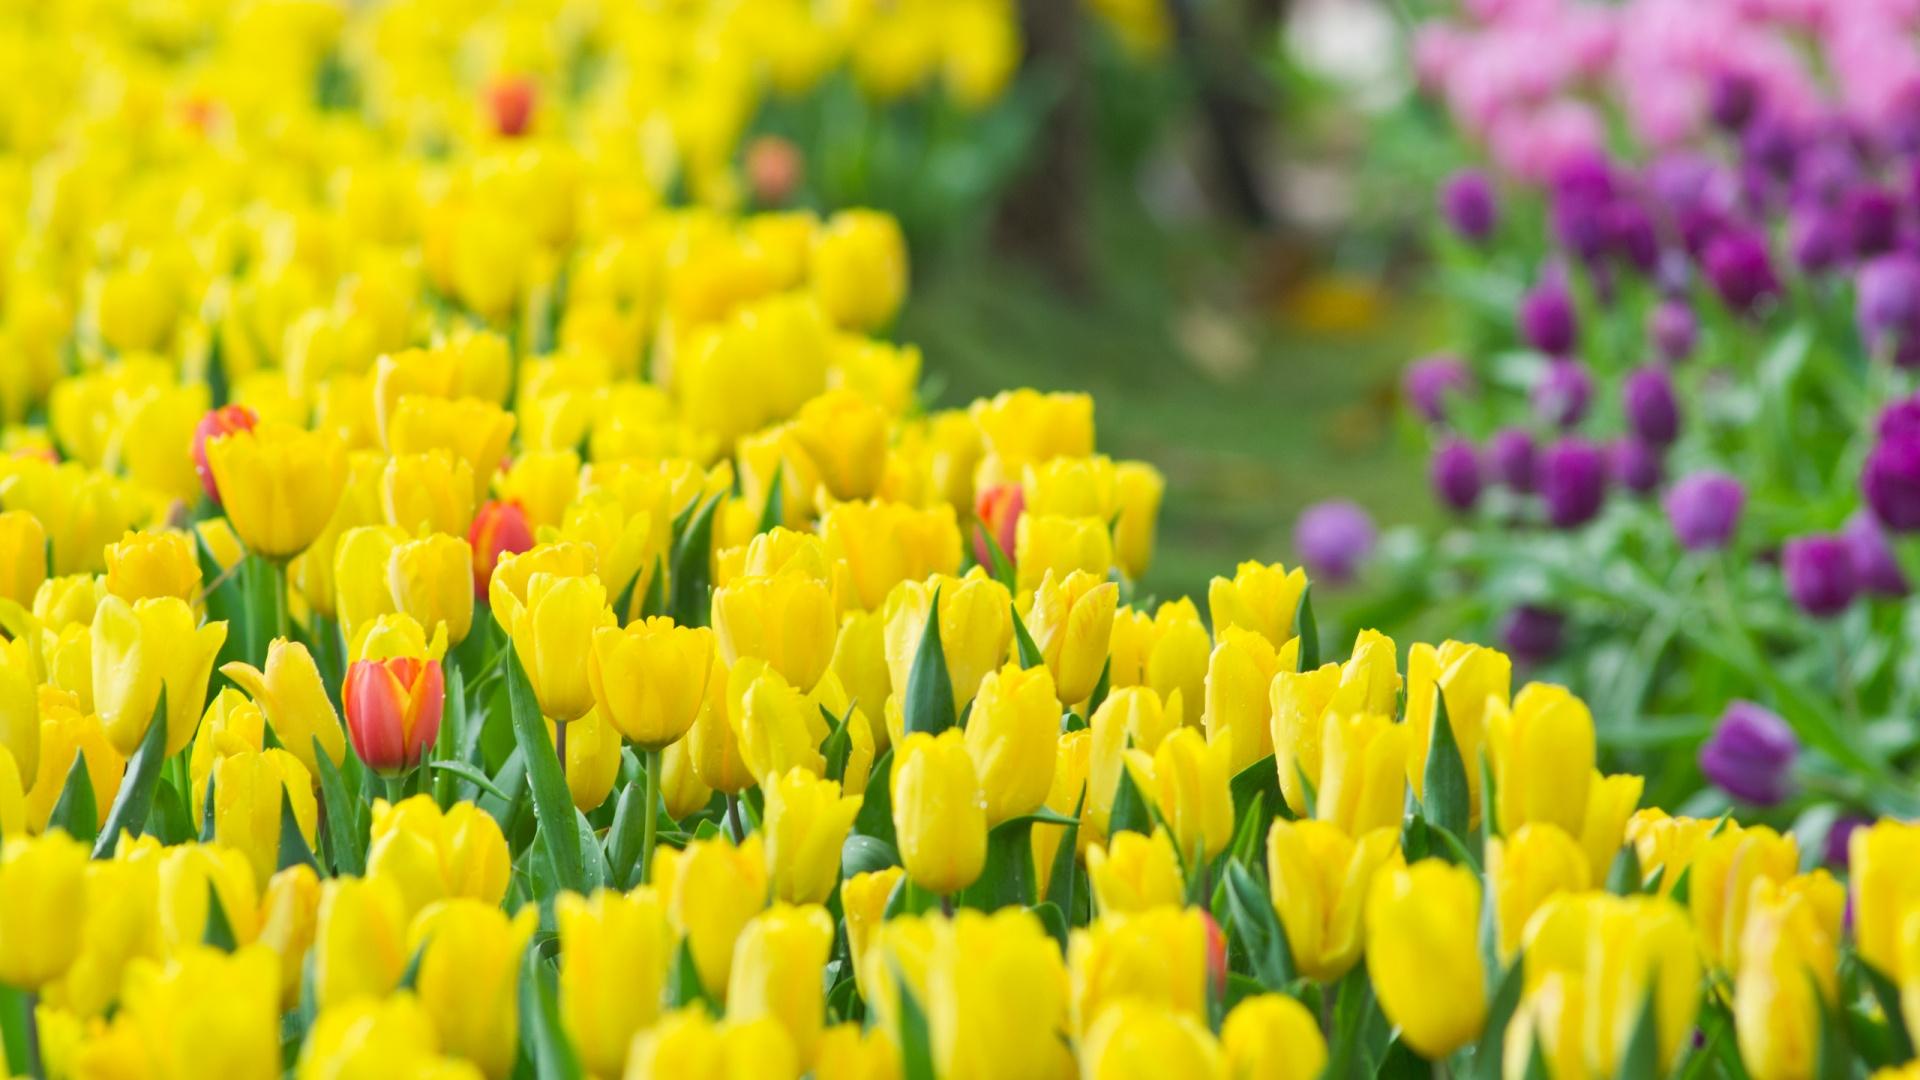 Yellow Flower Hd Wallpaper Free